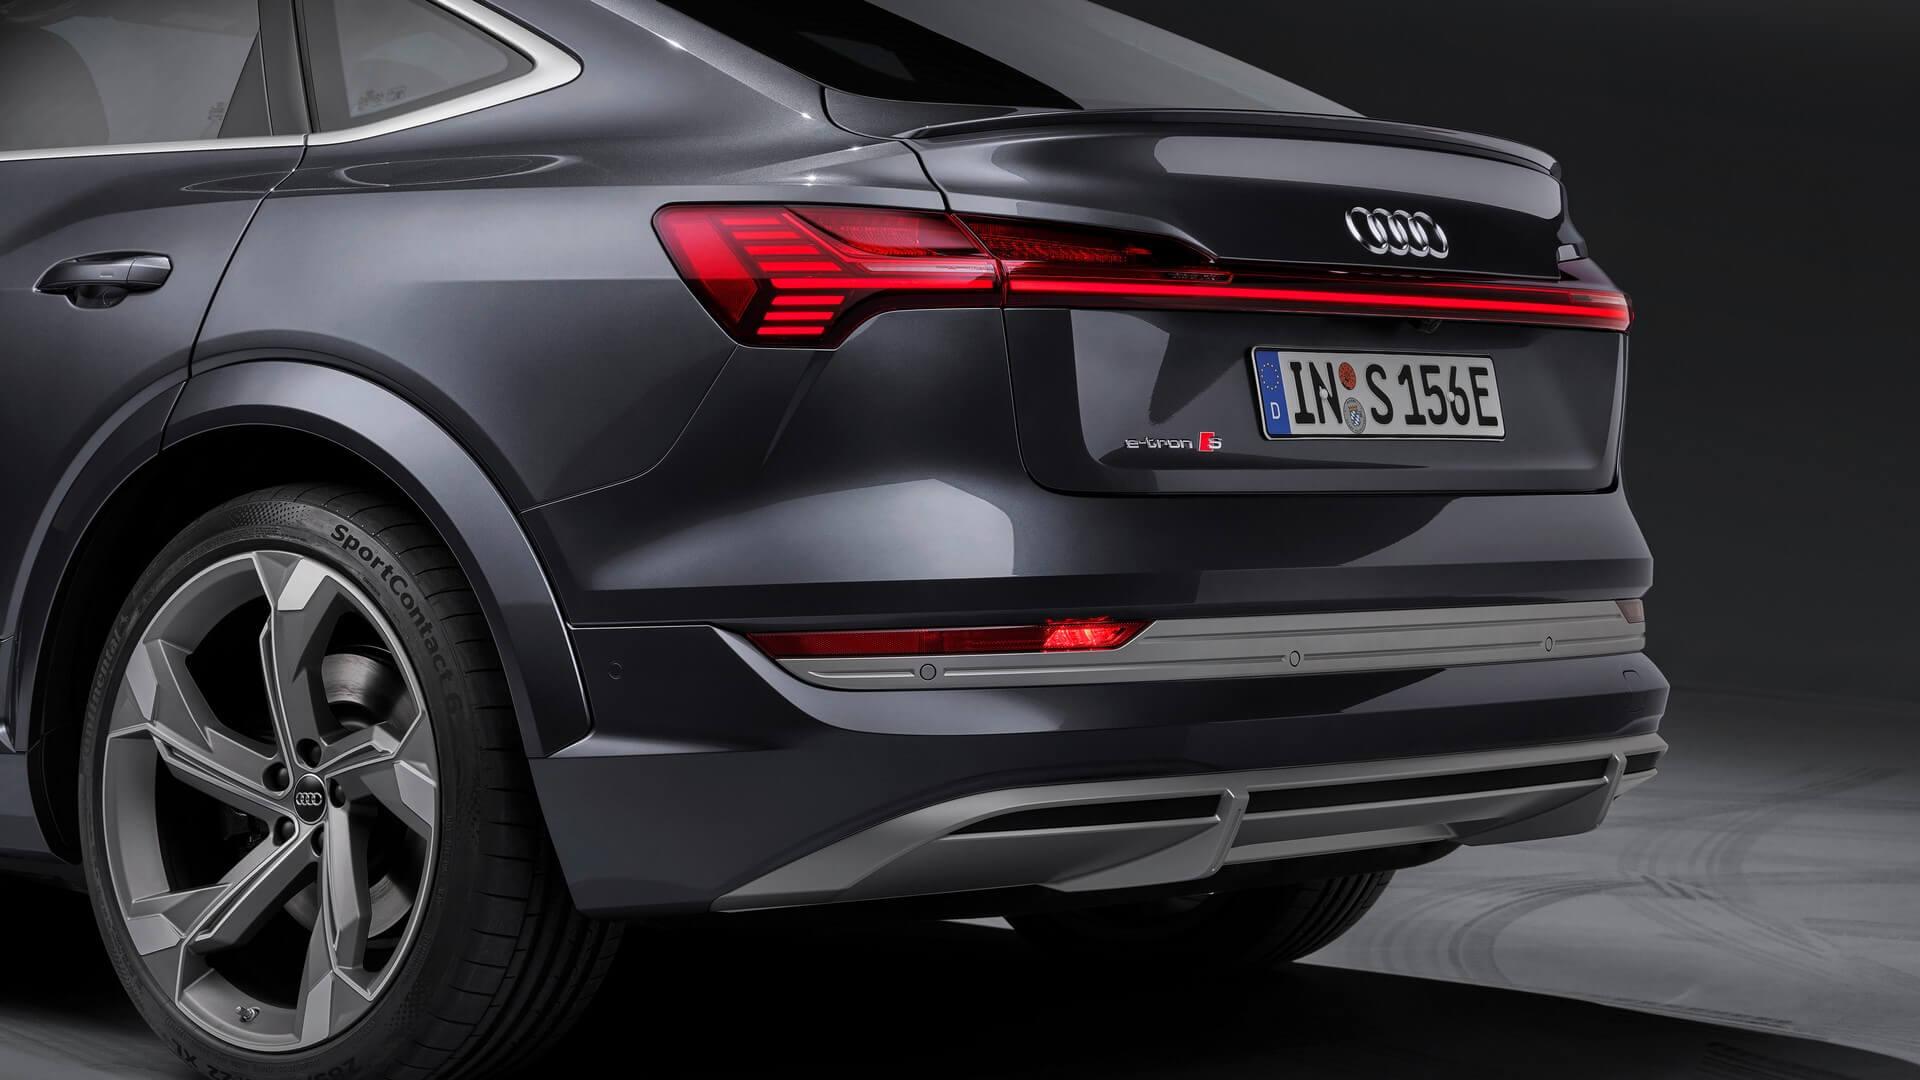 Audi-E-Tron-S-and-E-Tron-S-Sportback-2020-97